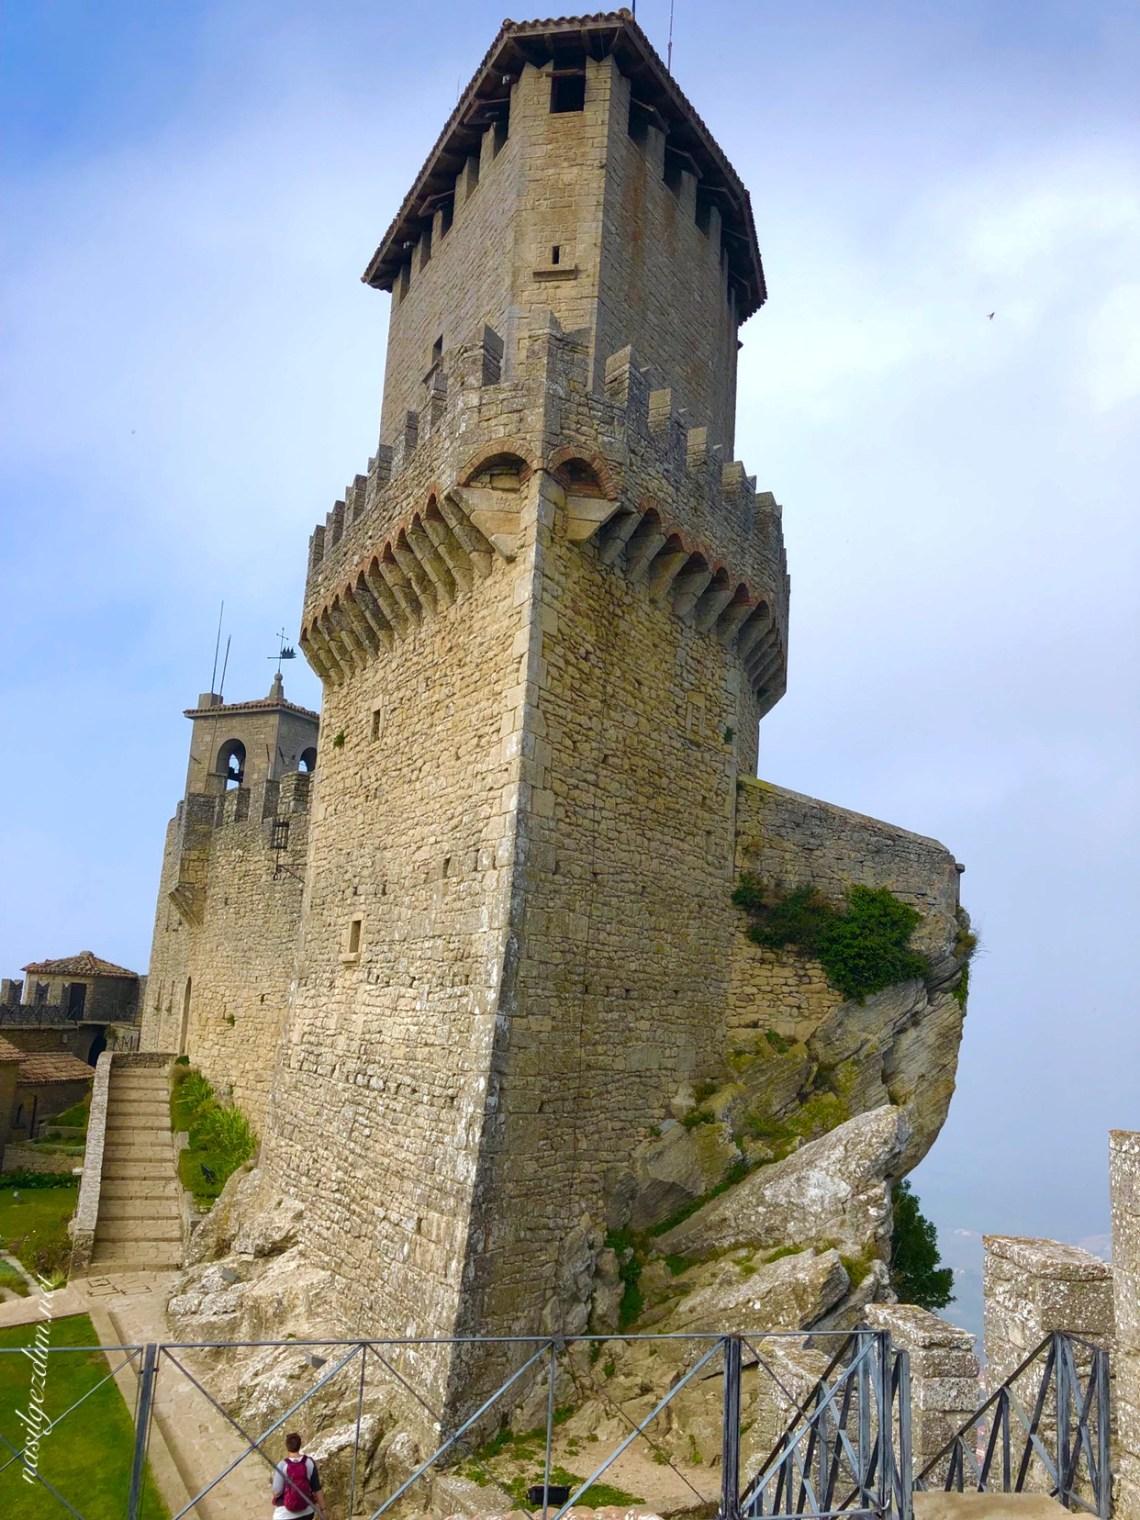 san marino gezilecek yerler, san marino gezi rehberi, san marino nerede, san marino gez notları, San Marino Guiata Kulesi